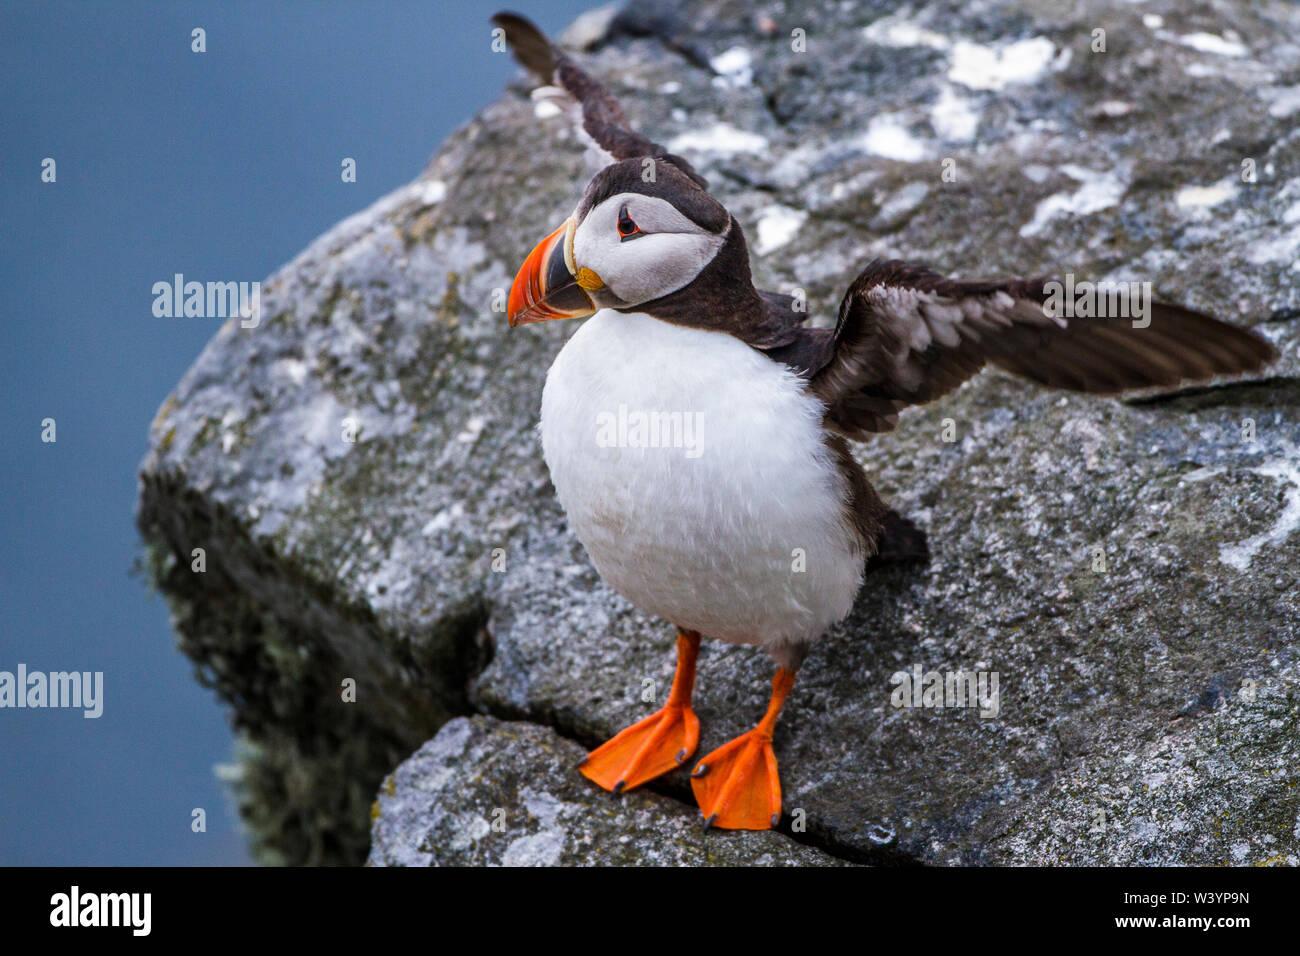 Atlantic puffin, Papageitaucher (Fratercula arctica) Stock Photo